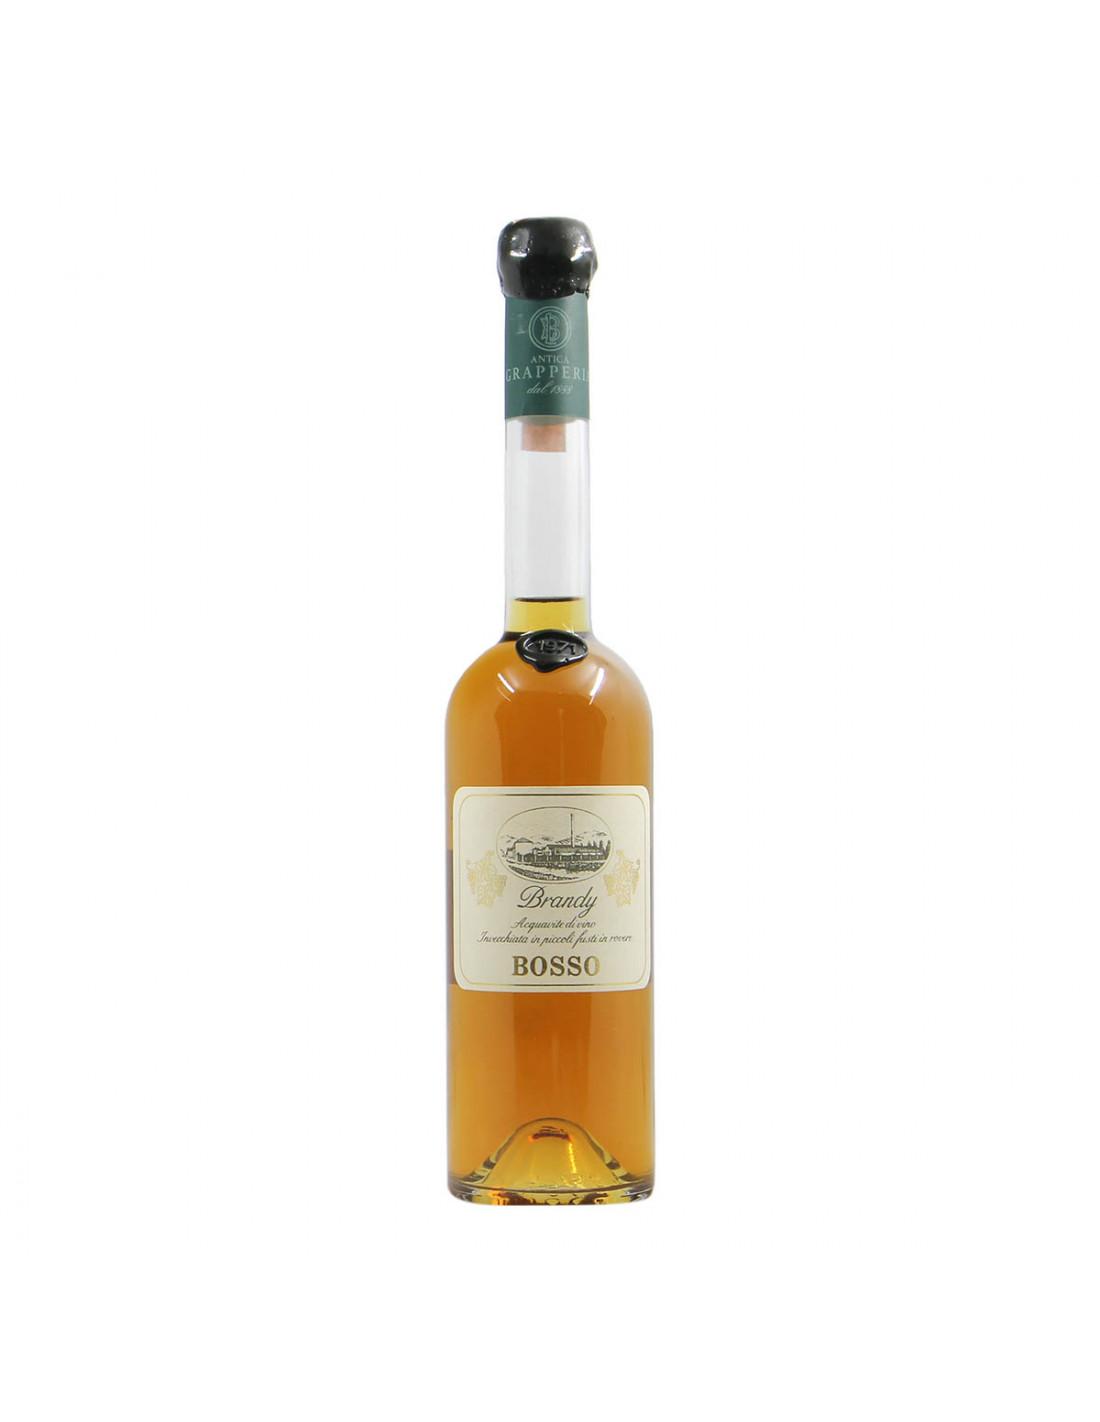 Bosso Brandy 1971 Grandi Bottiglie